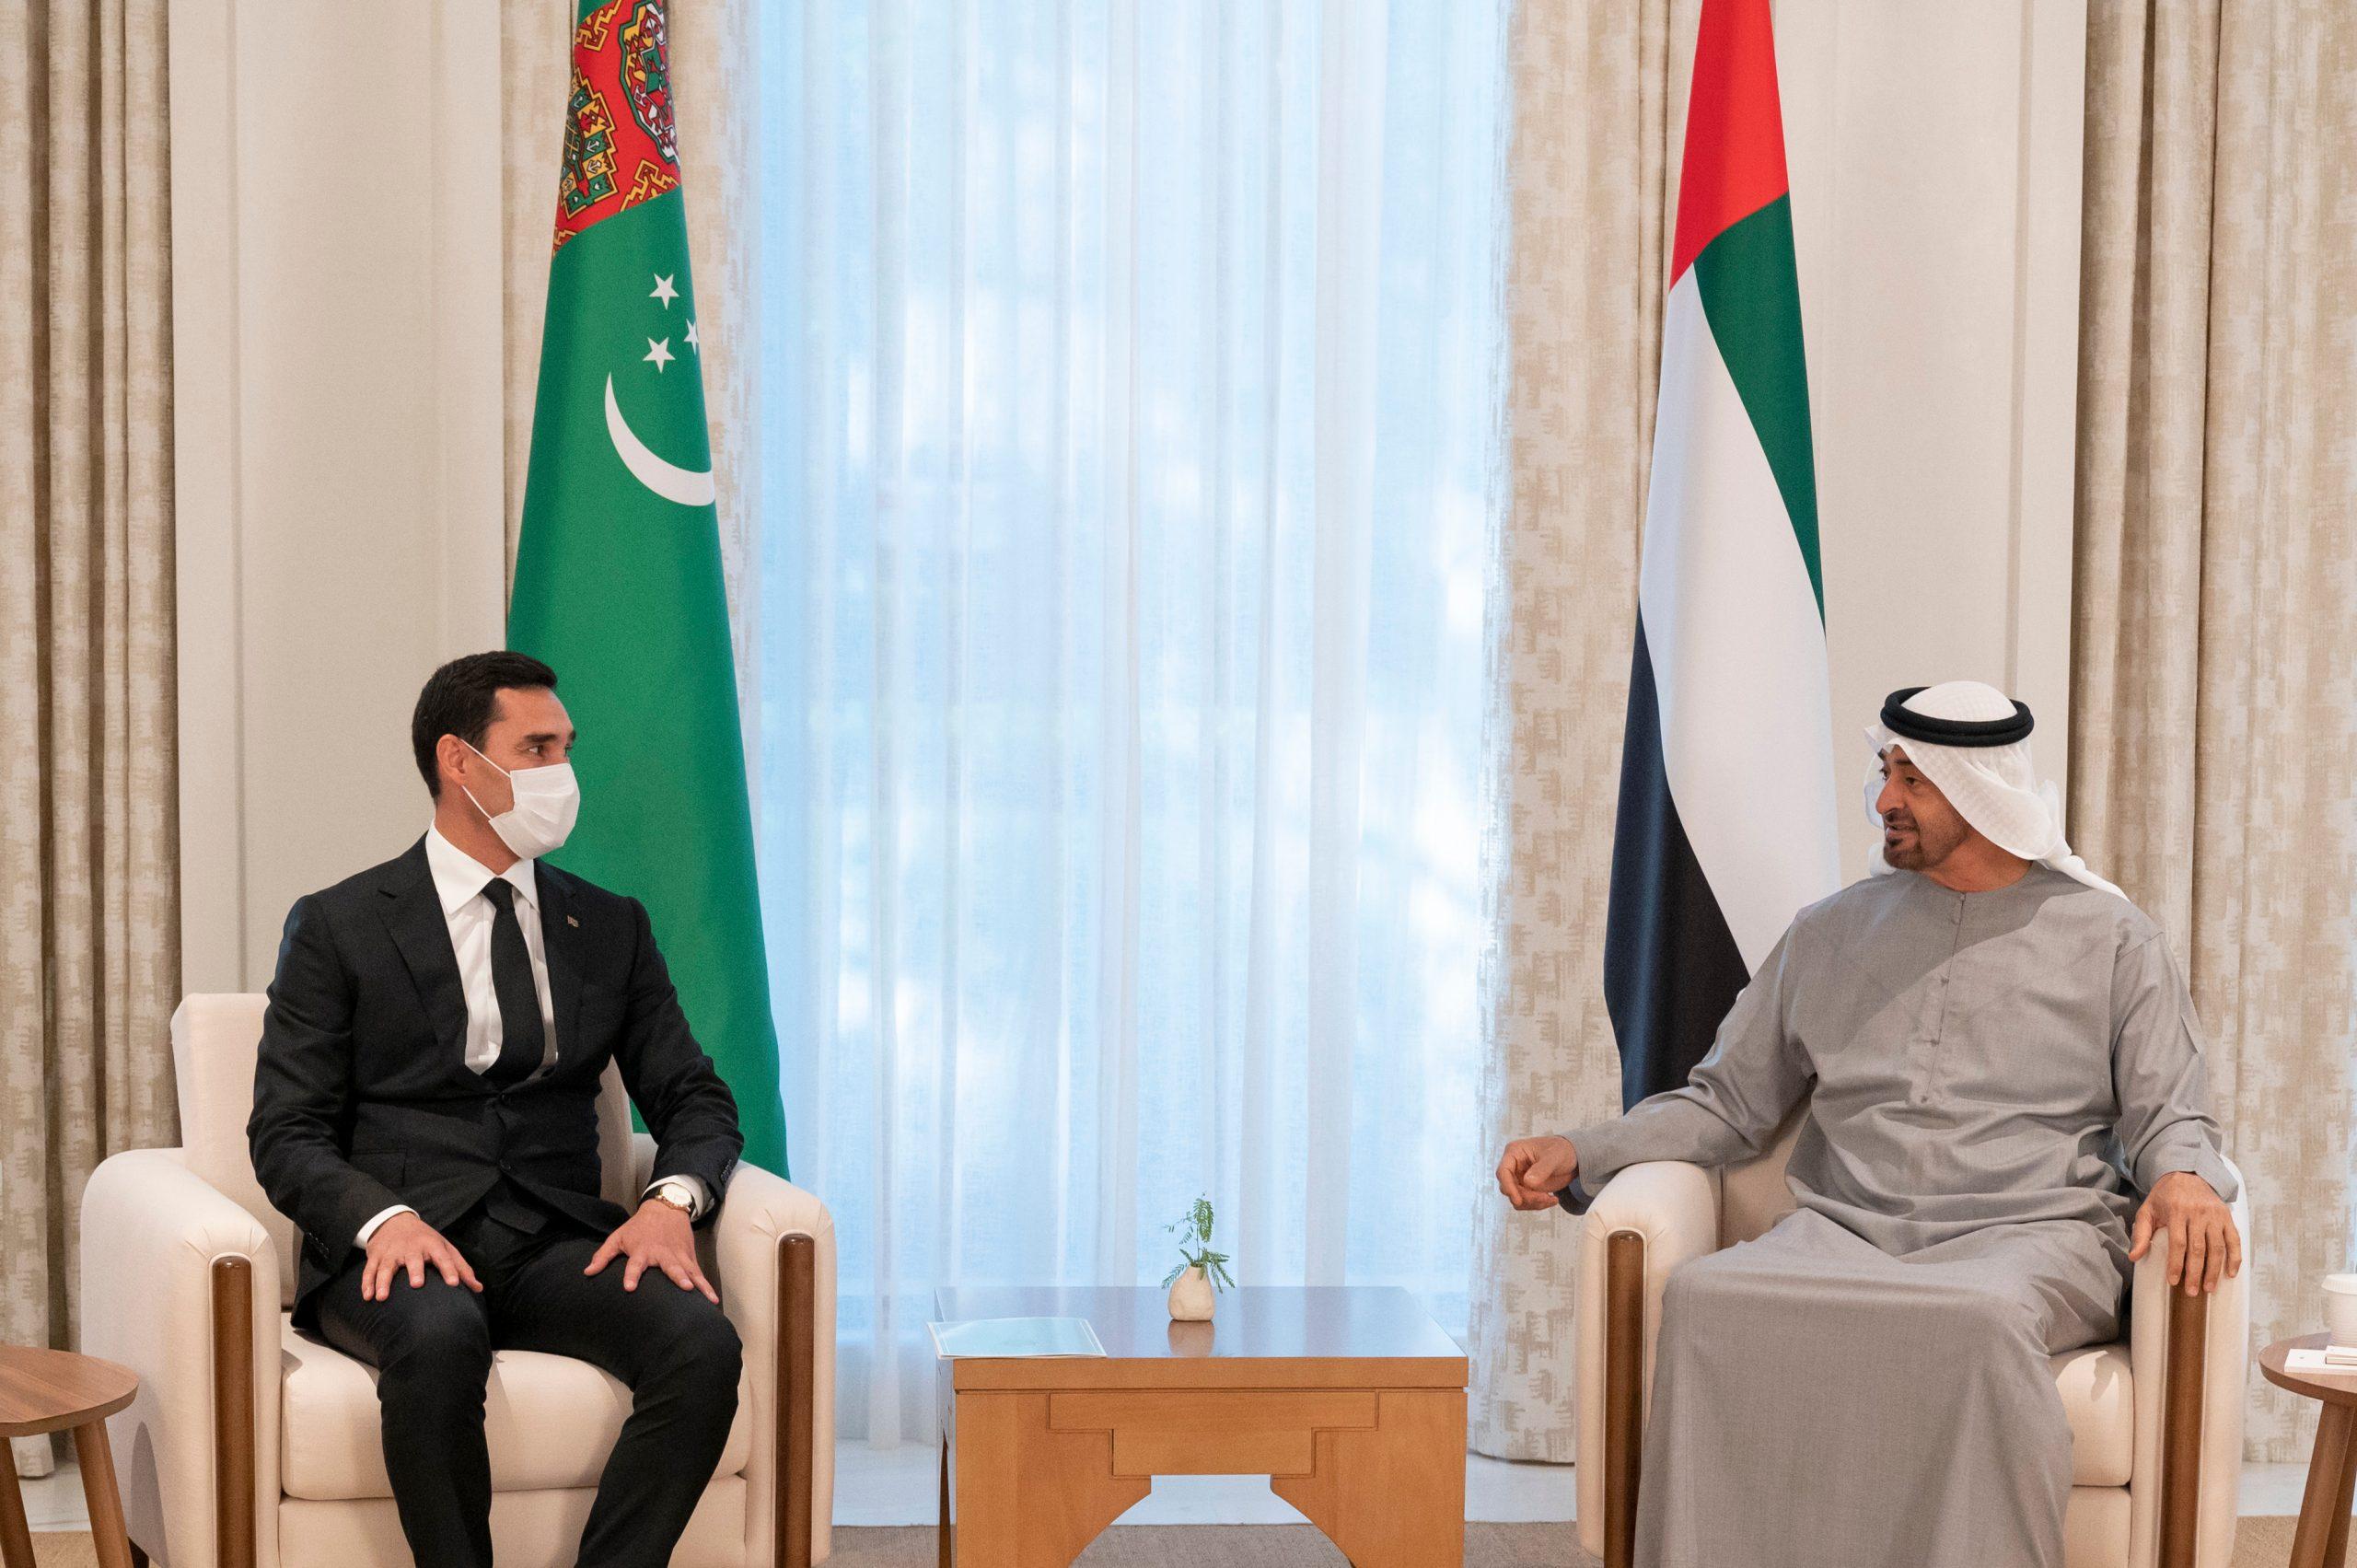 محمد بن زايد يلتقي نائب رئيس وزراء تركمانستان